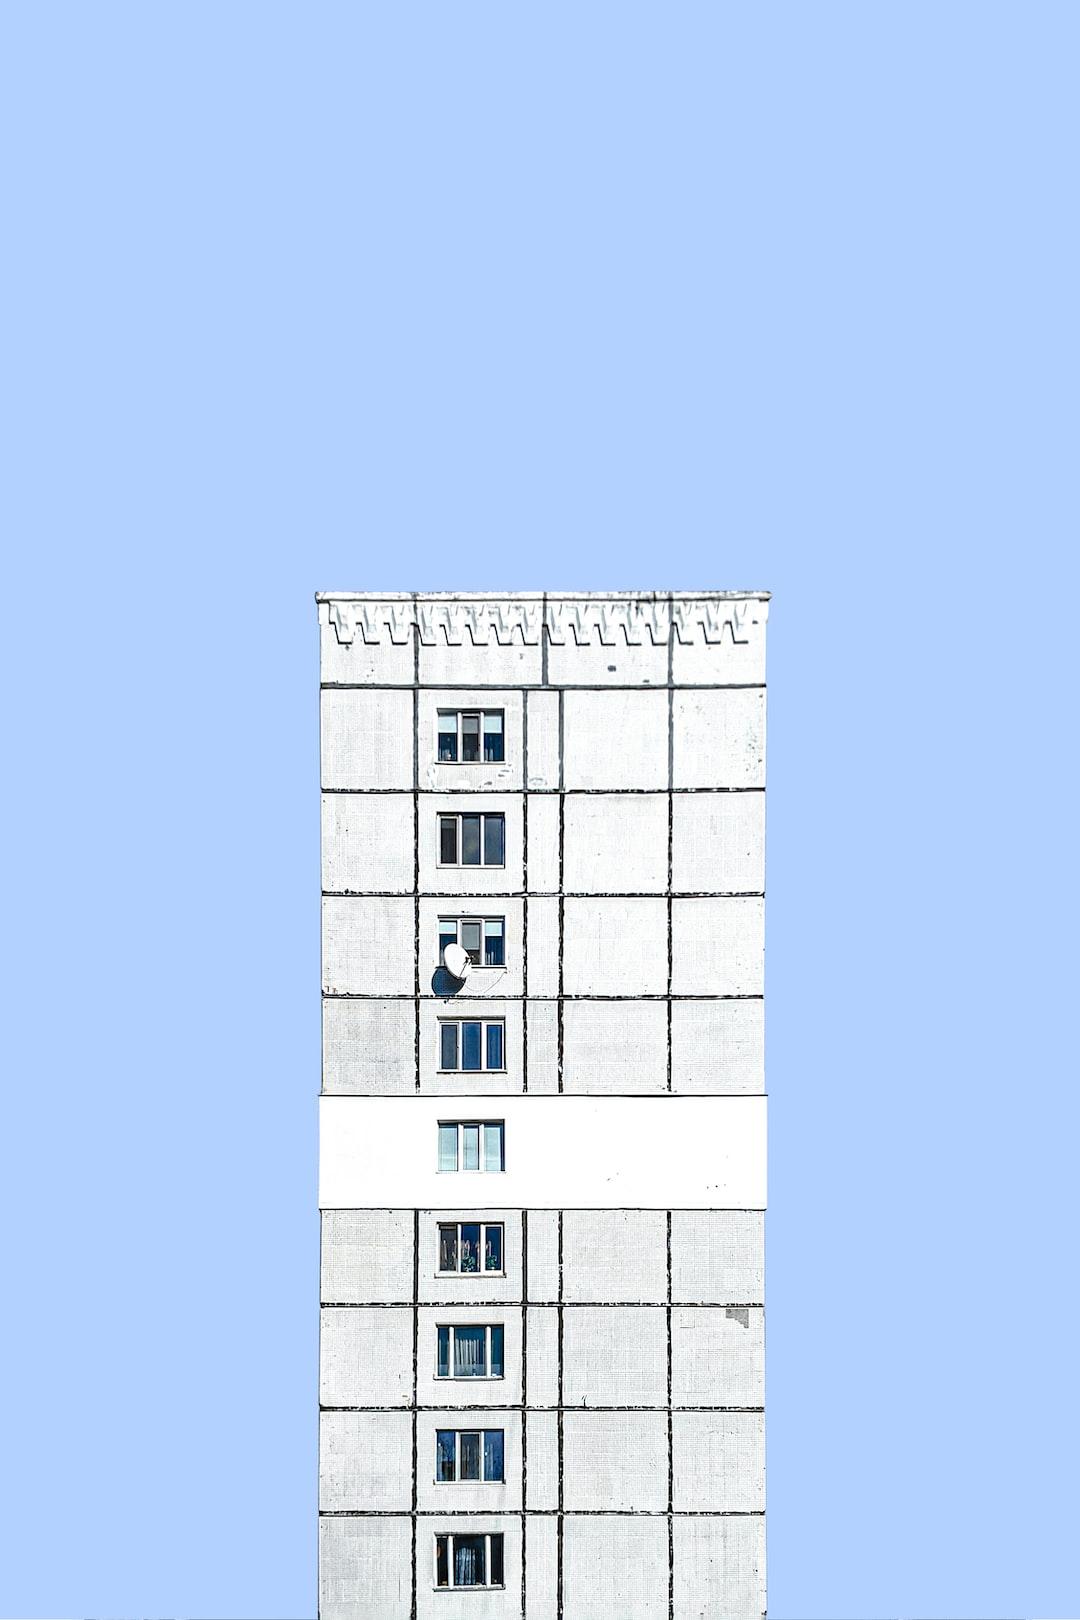 Living blocks